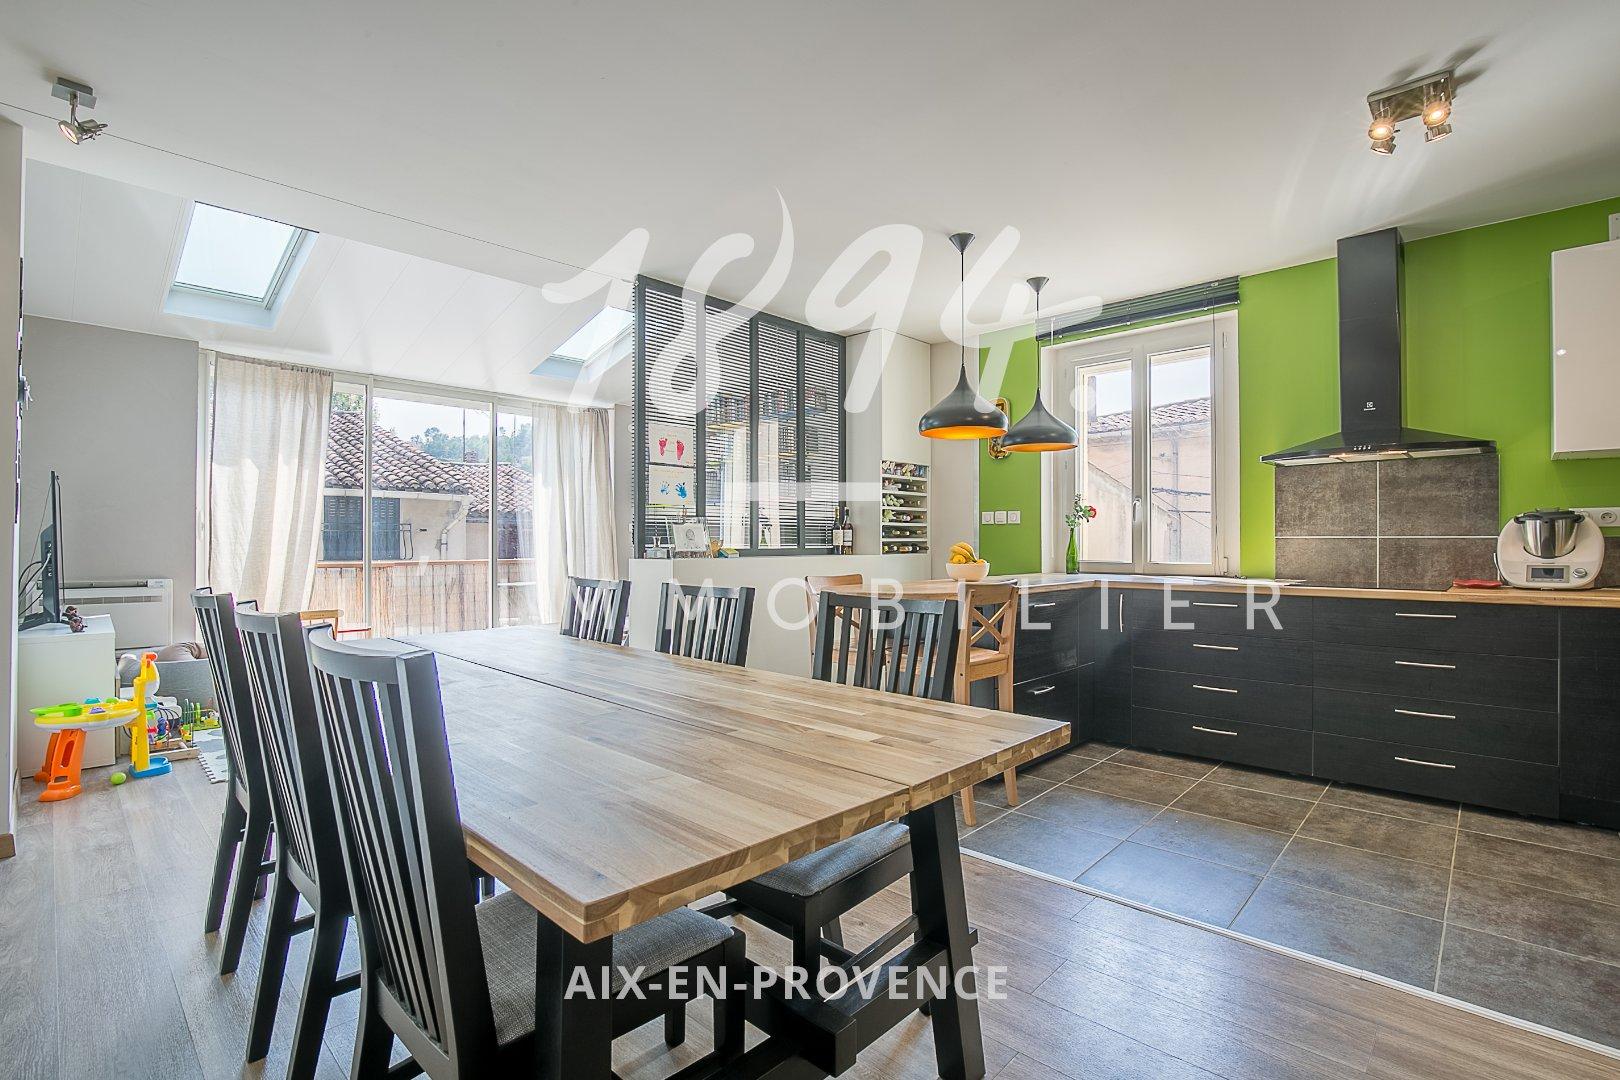 Appartement type 3 d'environ 88 m2